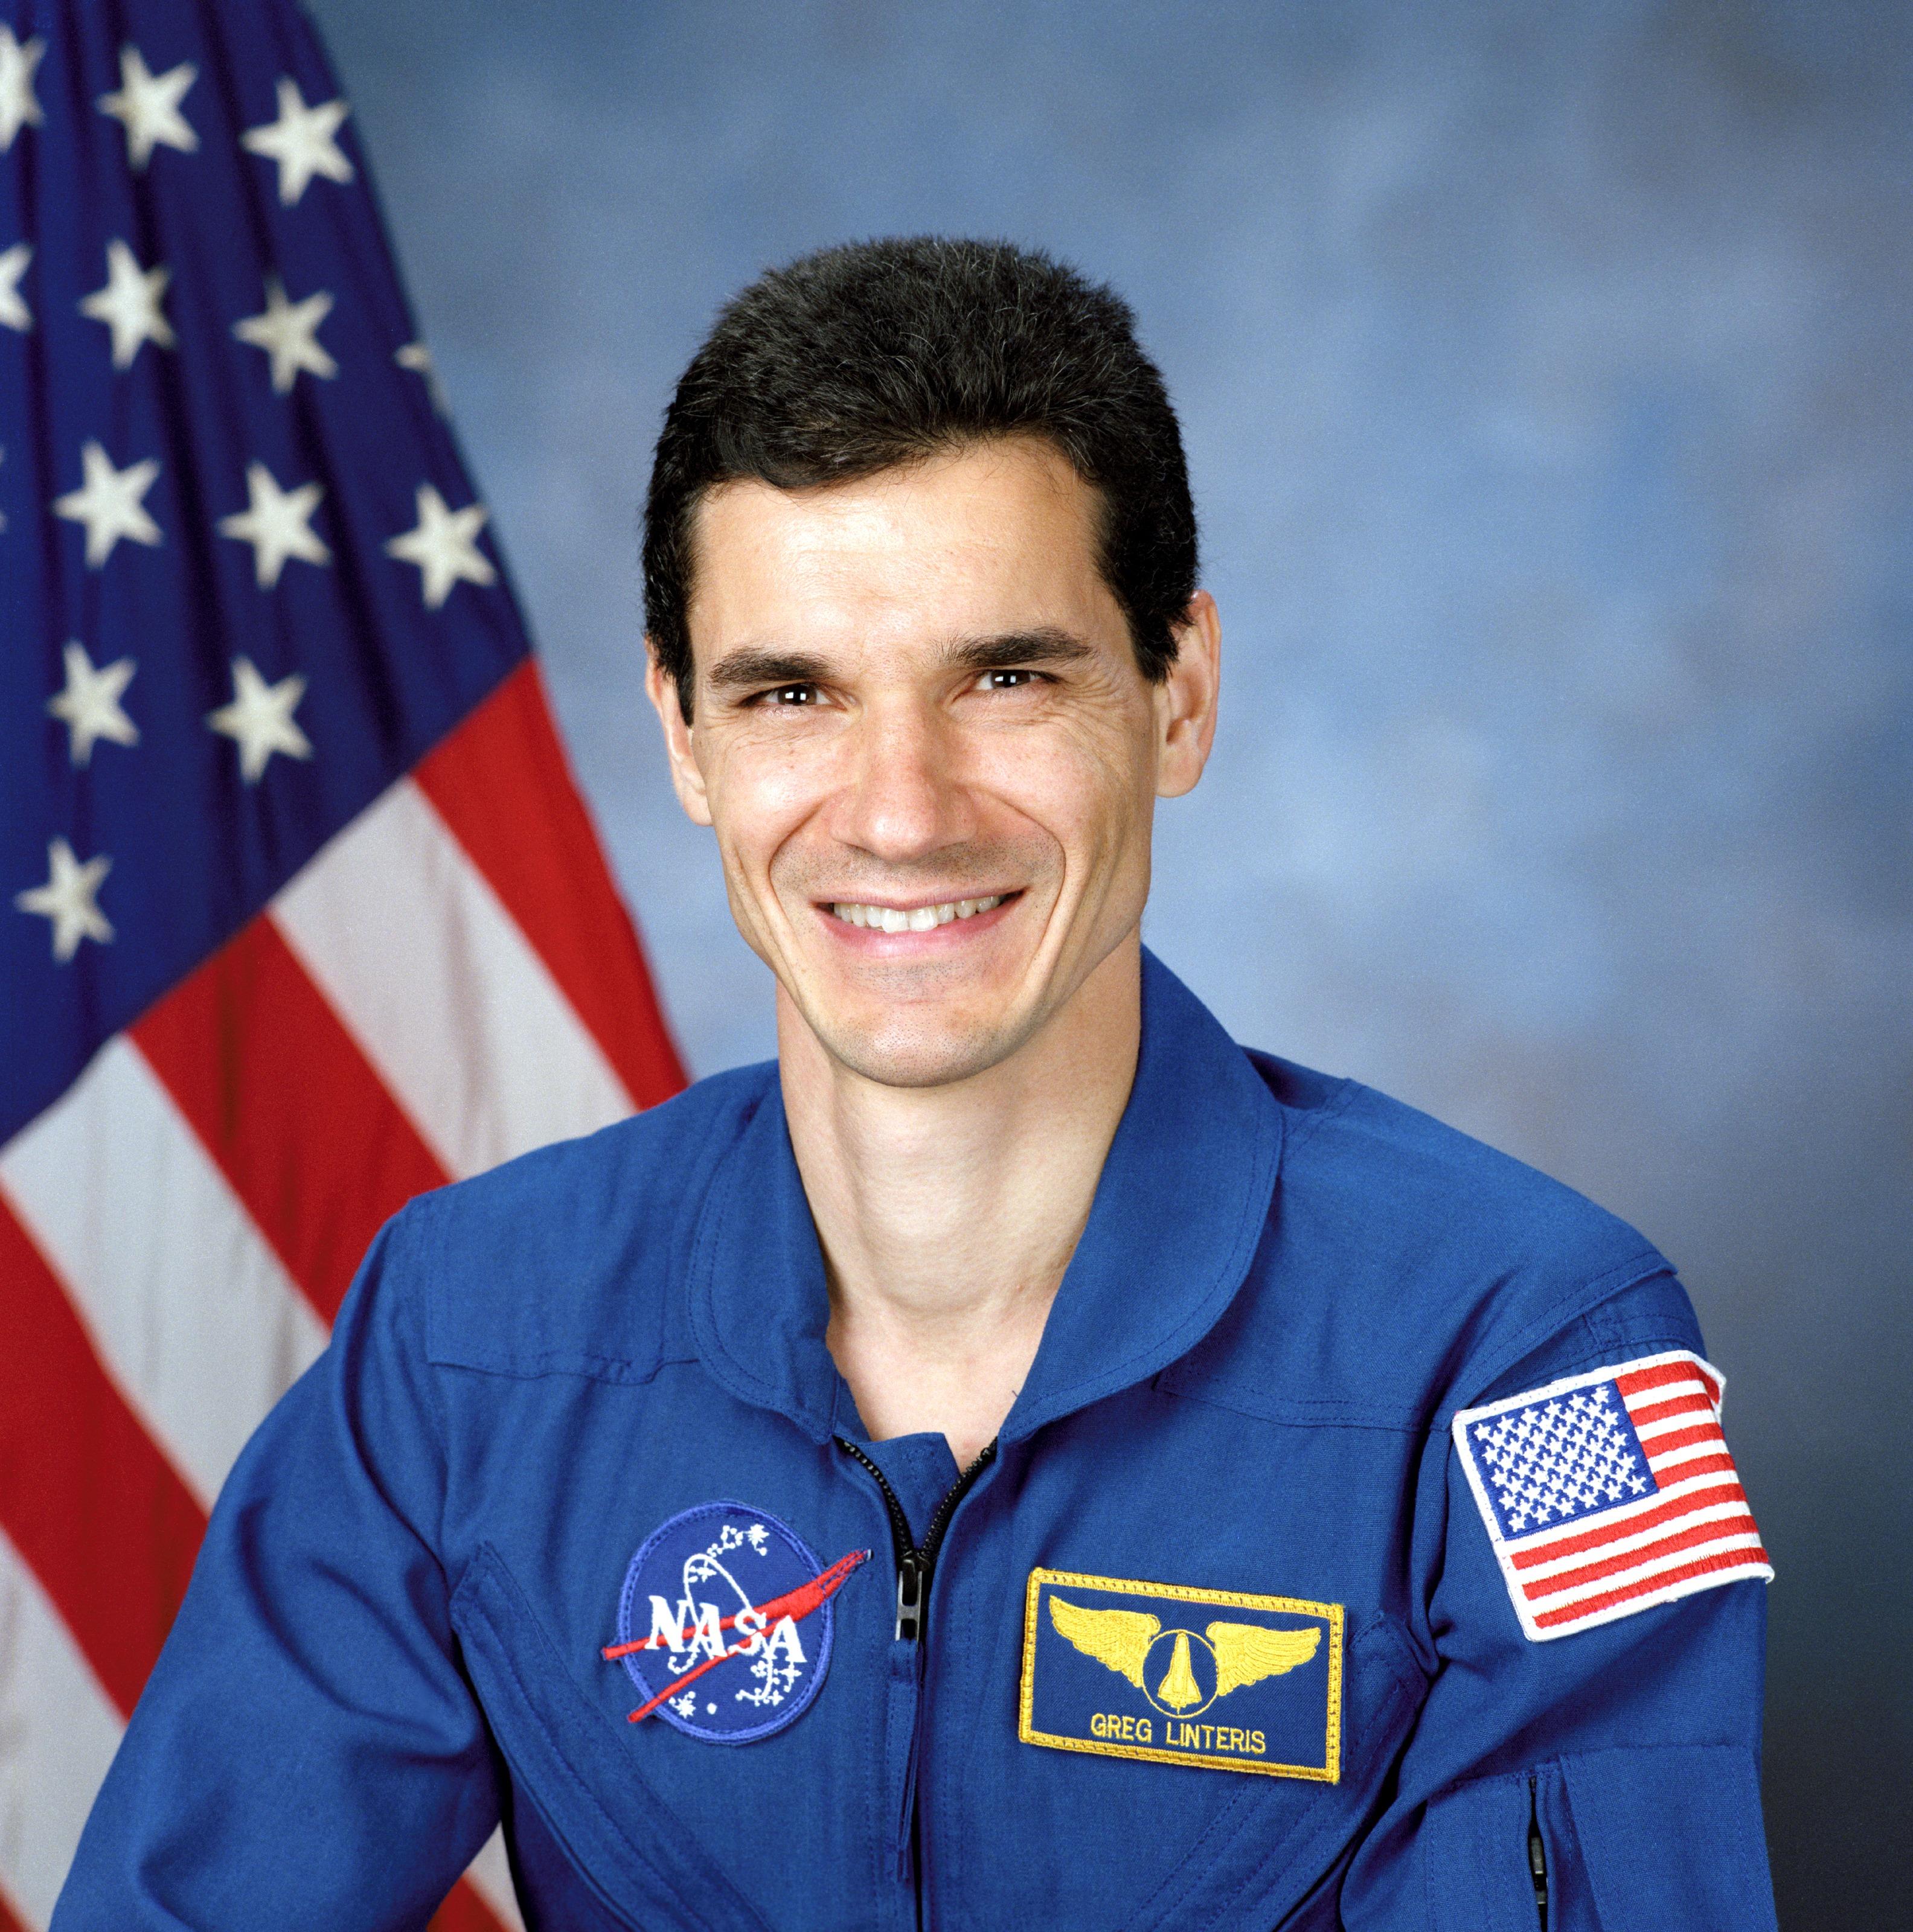 Astronaut Gregory T. Linteris, STS-94 payload specialist, NASA photo (12 July 1996)Source: Wikipedia (spaceflight.nasa.gov killed 25 Feb 2021) Gregory_Linteris.jpg